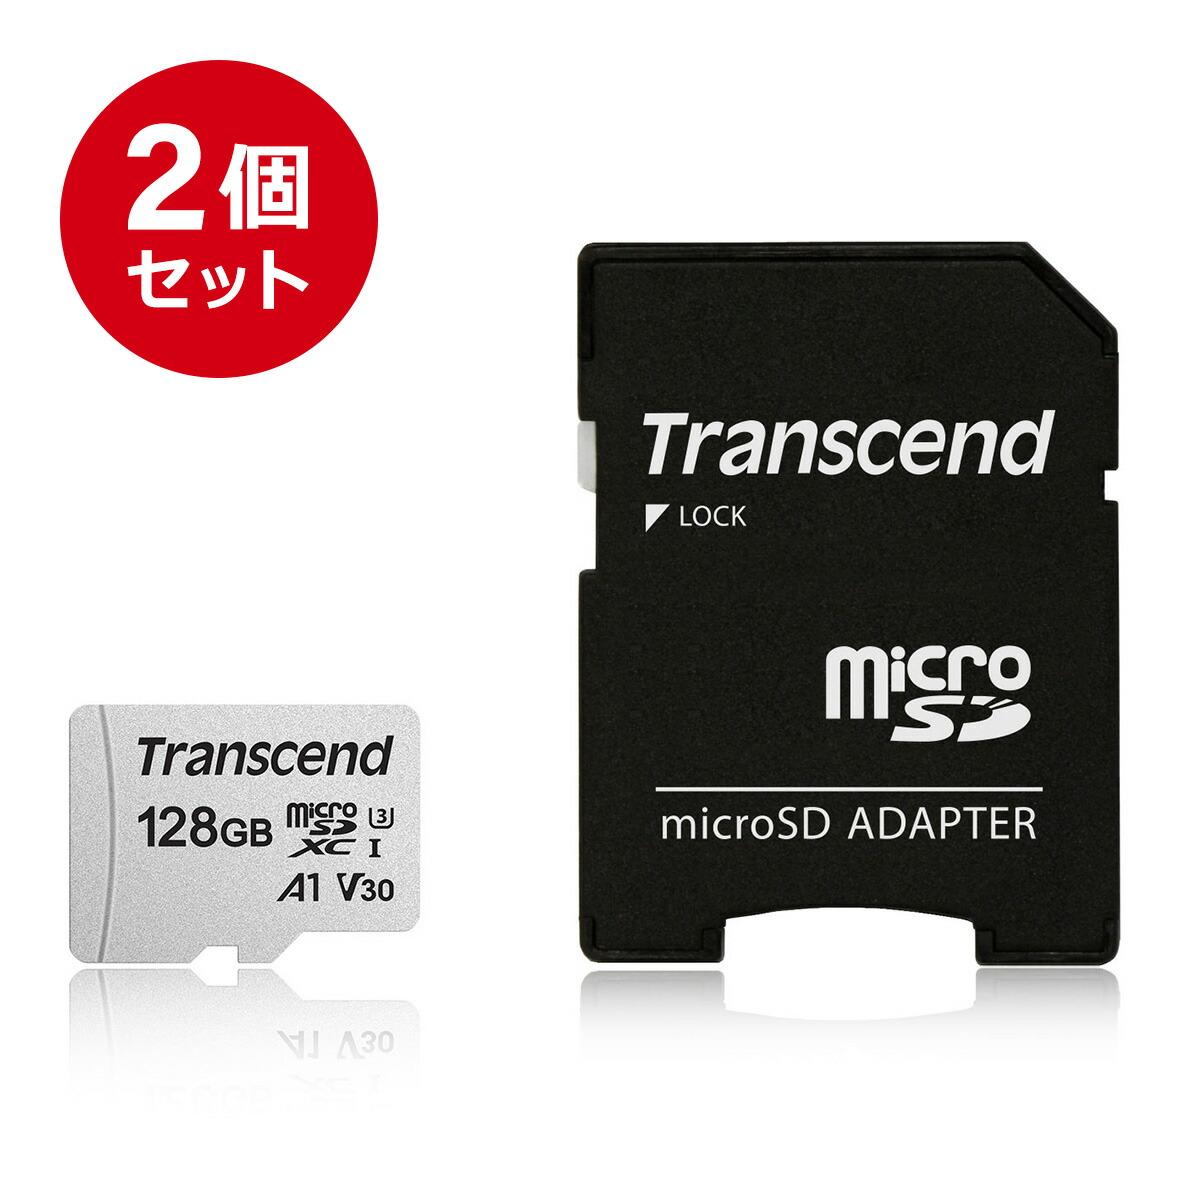 TS128GUSD300S-A ネコポス専用 送料無料 Transcend microSDカード 128GB Class10 テレビで話題 UHS-I U3 V30 A1 microSDXC SD変換アダプタ付き SDアダプター付 スマホ SD キャンペーンもお見逃しなく 卒業 5年保証 マイクロSD 入学 クラス10